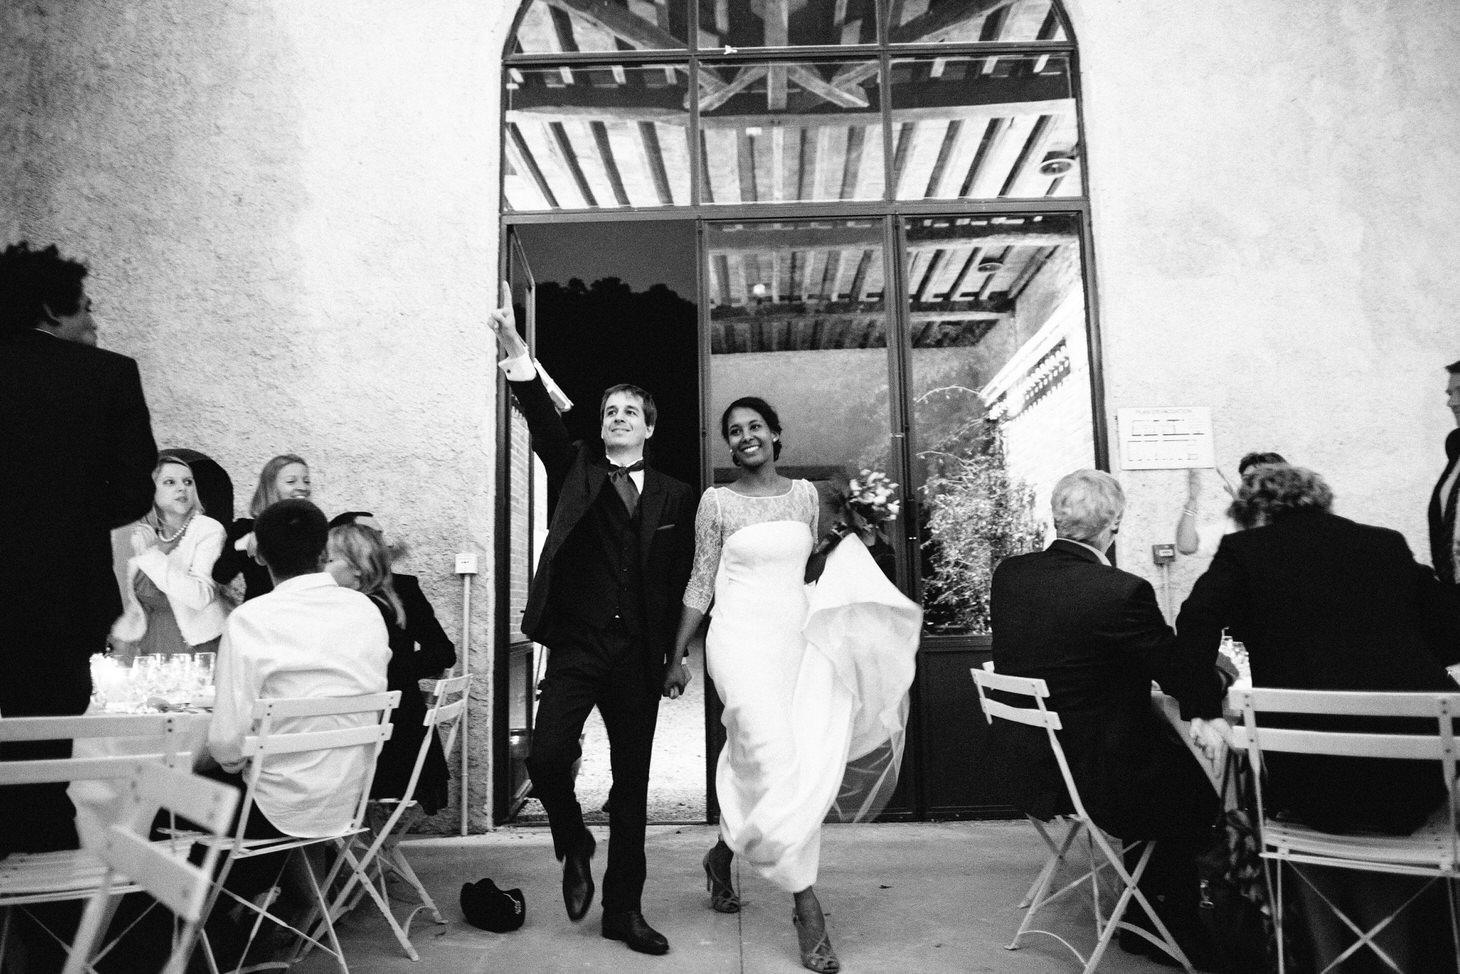 photographe-mariage-lyon-0837